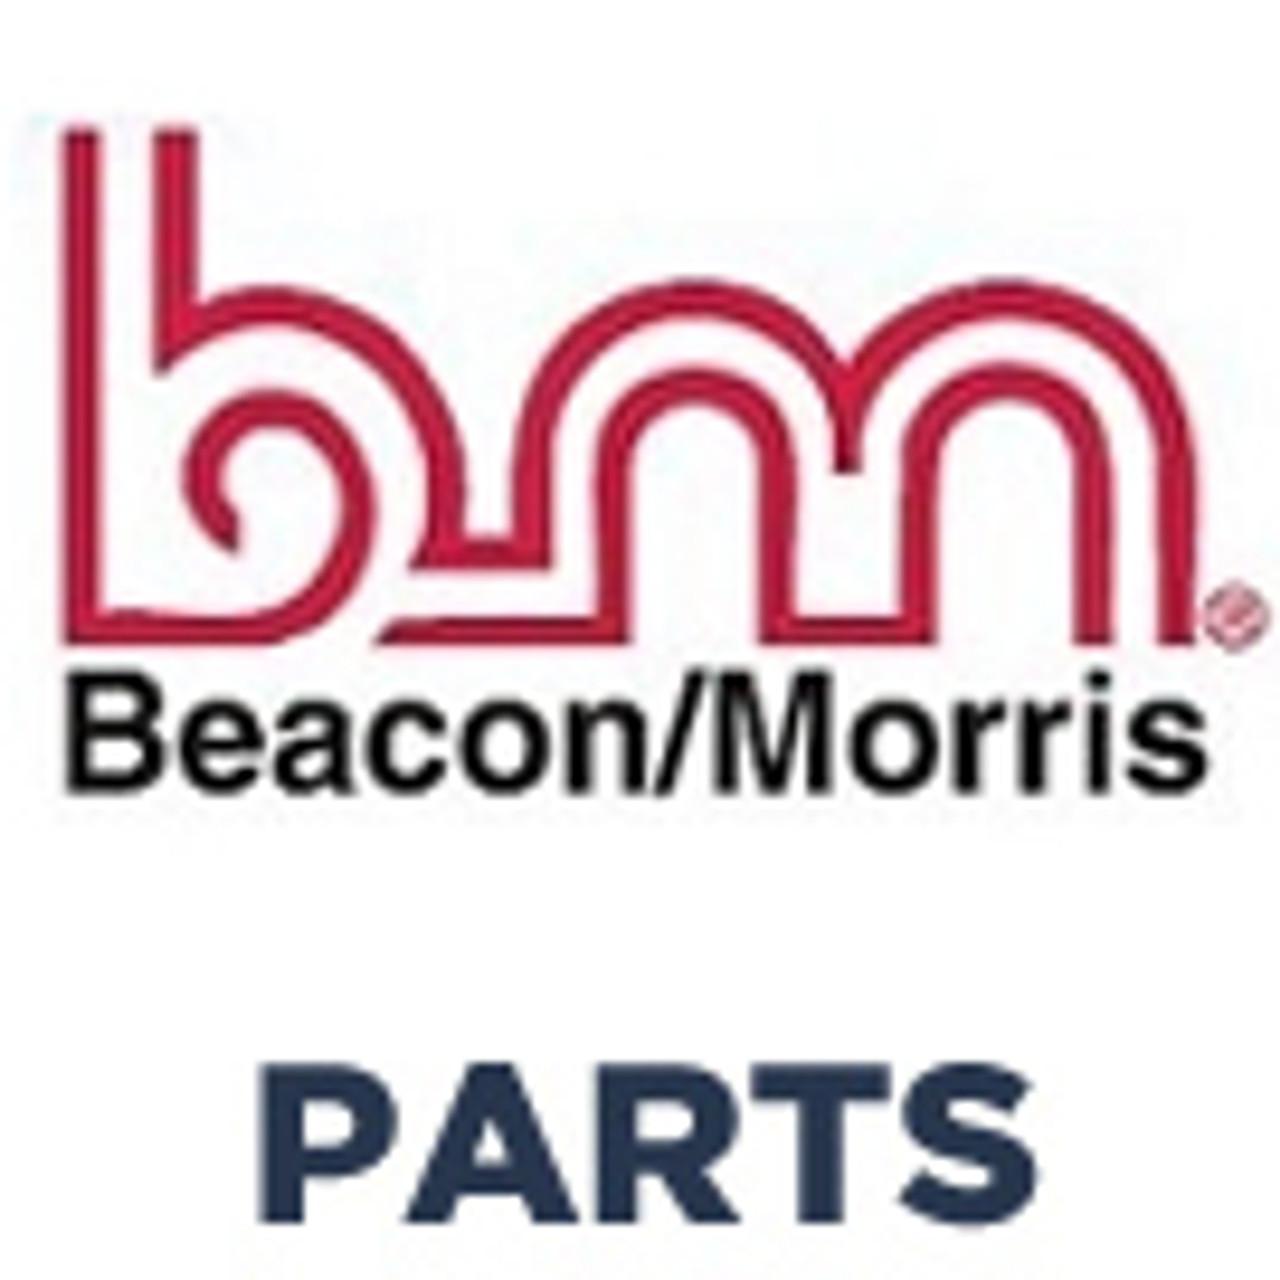 Beacon Morris Parts